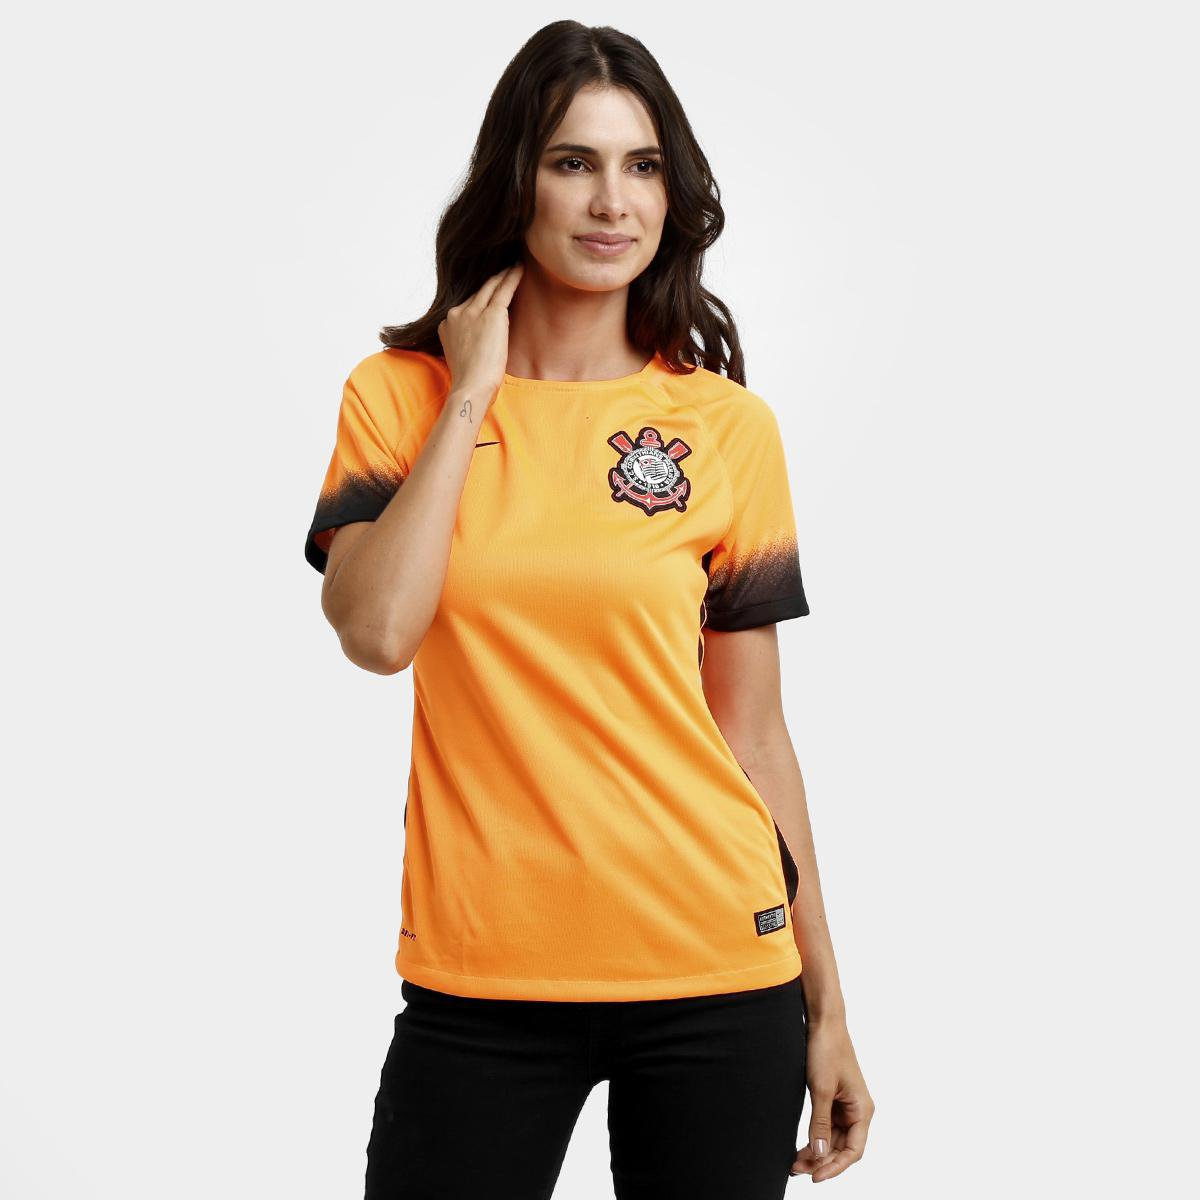 cb6891e663 Camisa Corinthians III 2015 s nº Torcedor Nike Feminina - Compre Agora